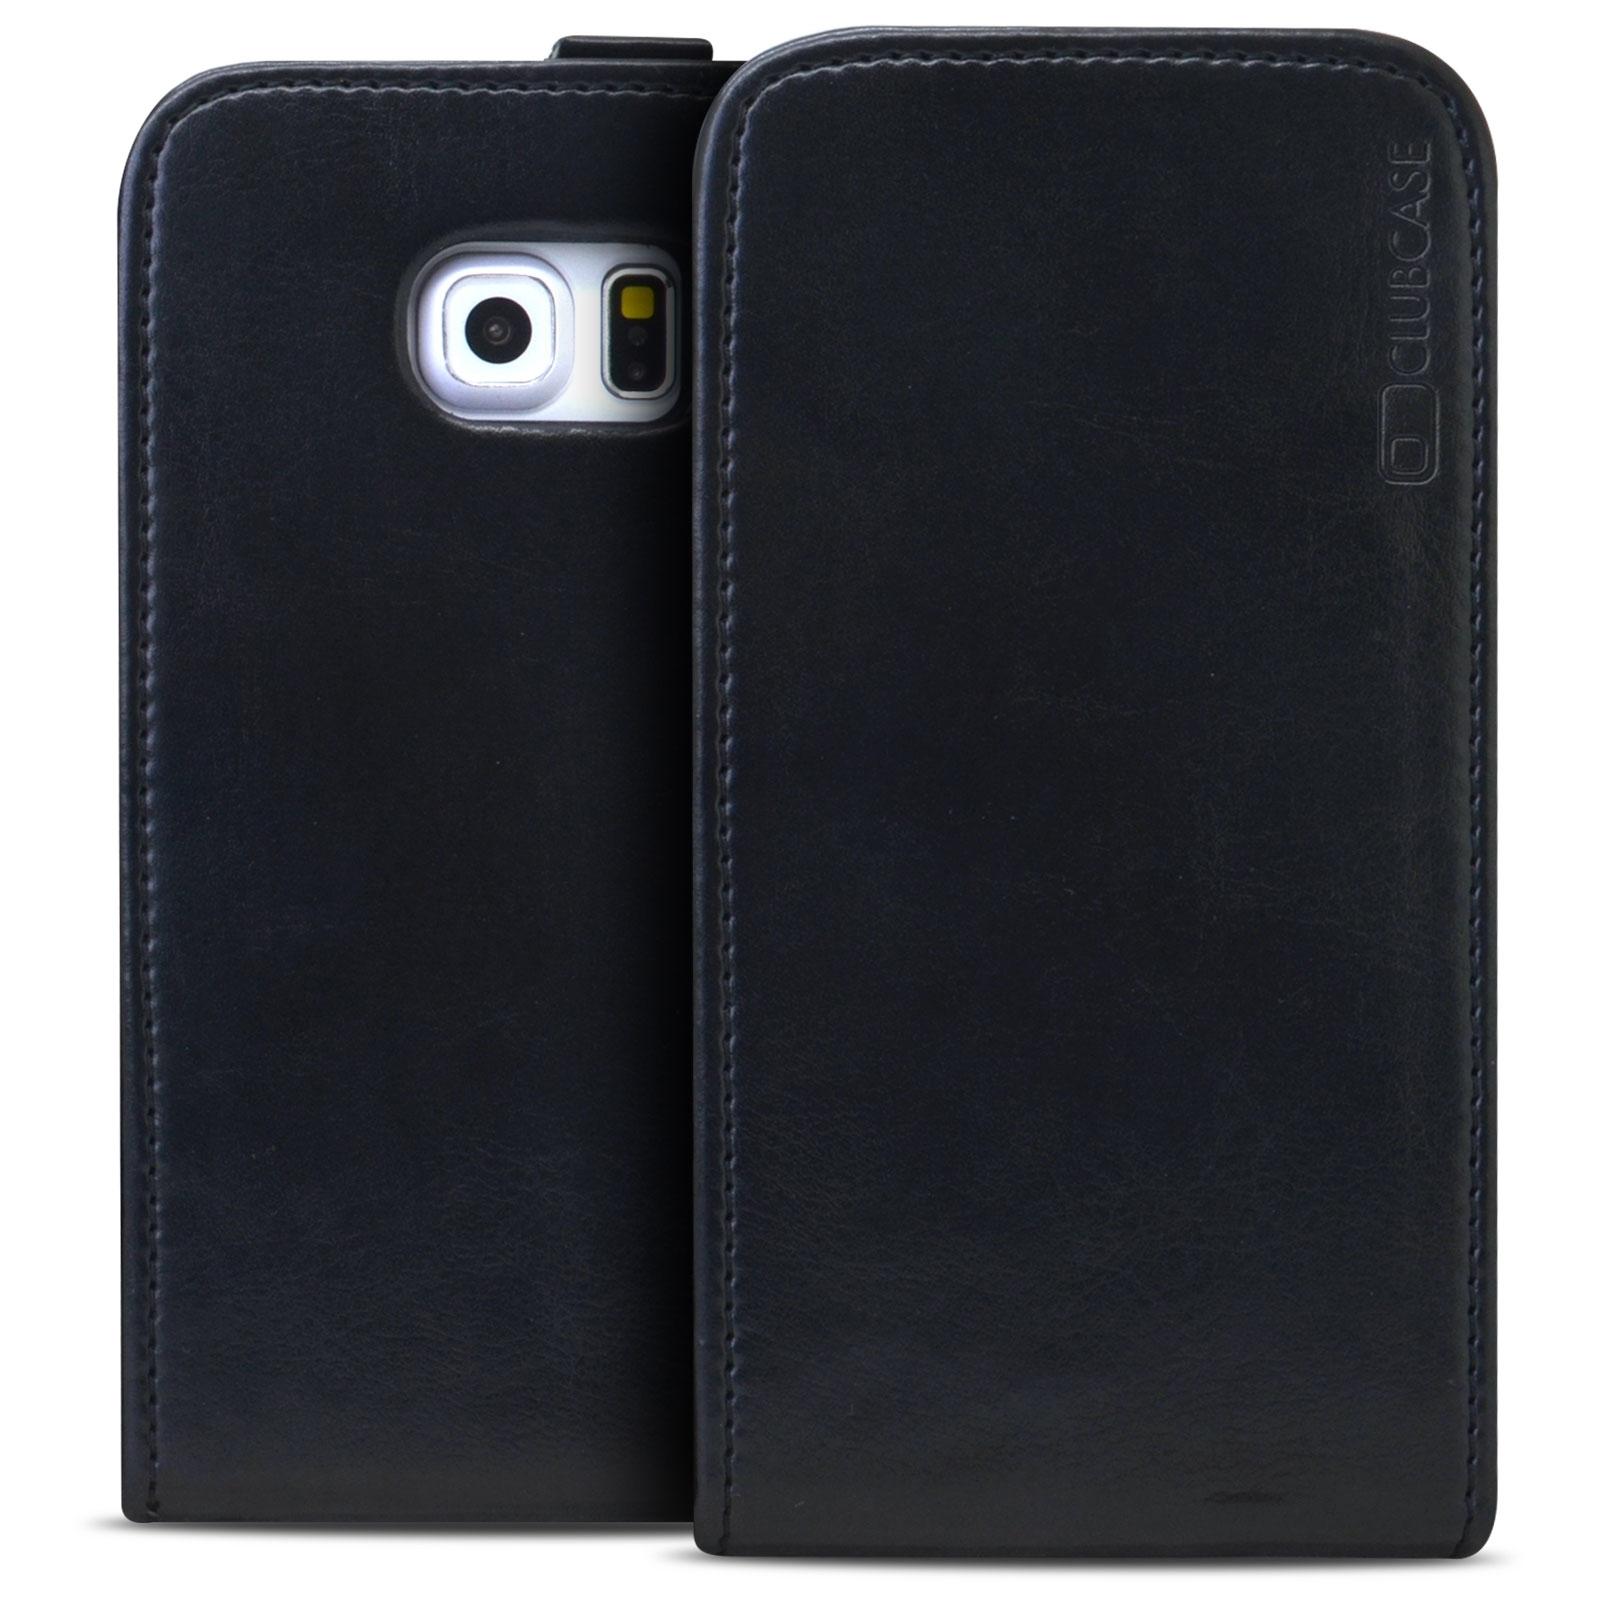 Coque Rabat Vertical Souple Samsung Galaxy S6 Edge Cuir Véritable Noir